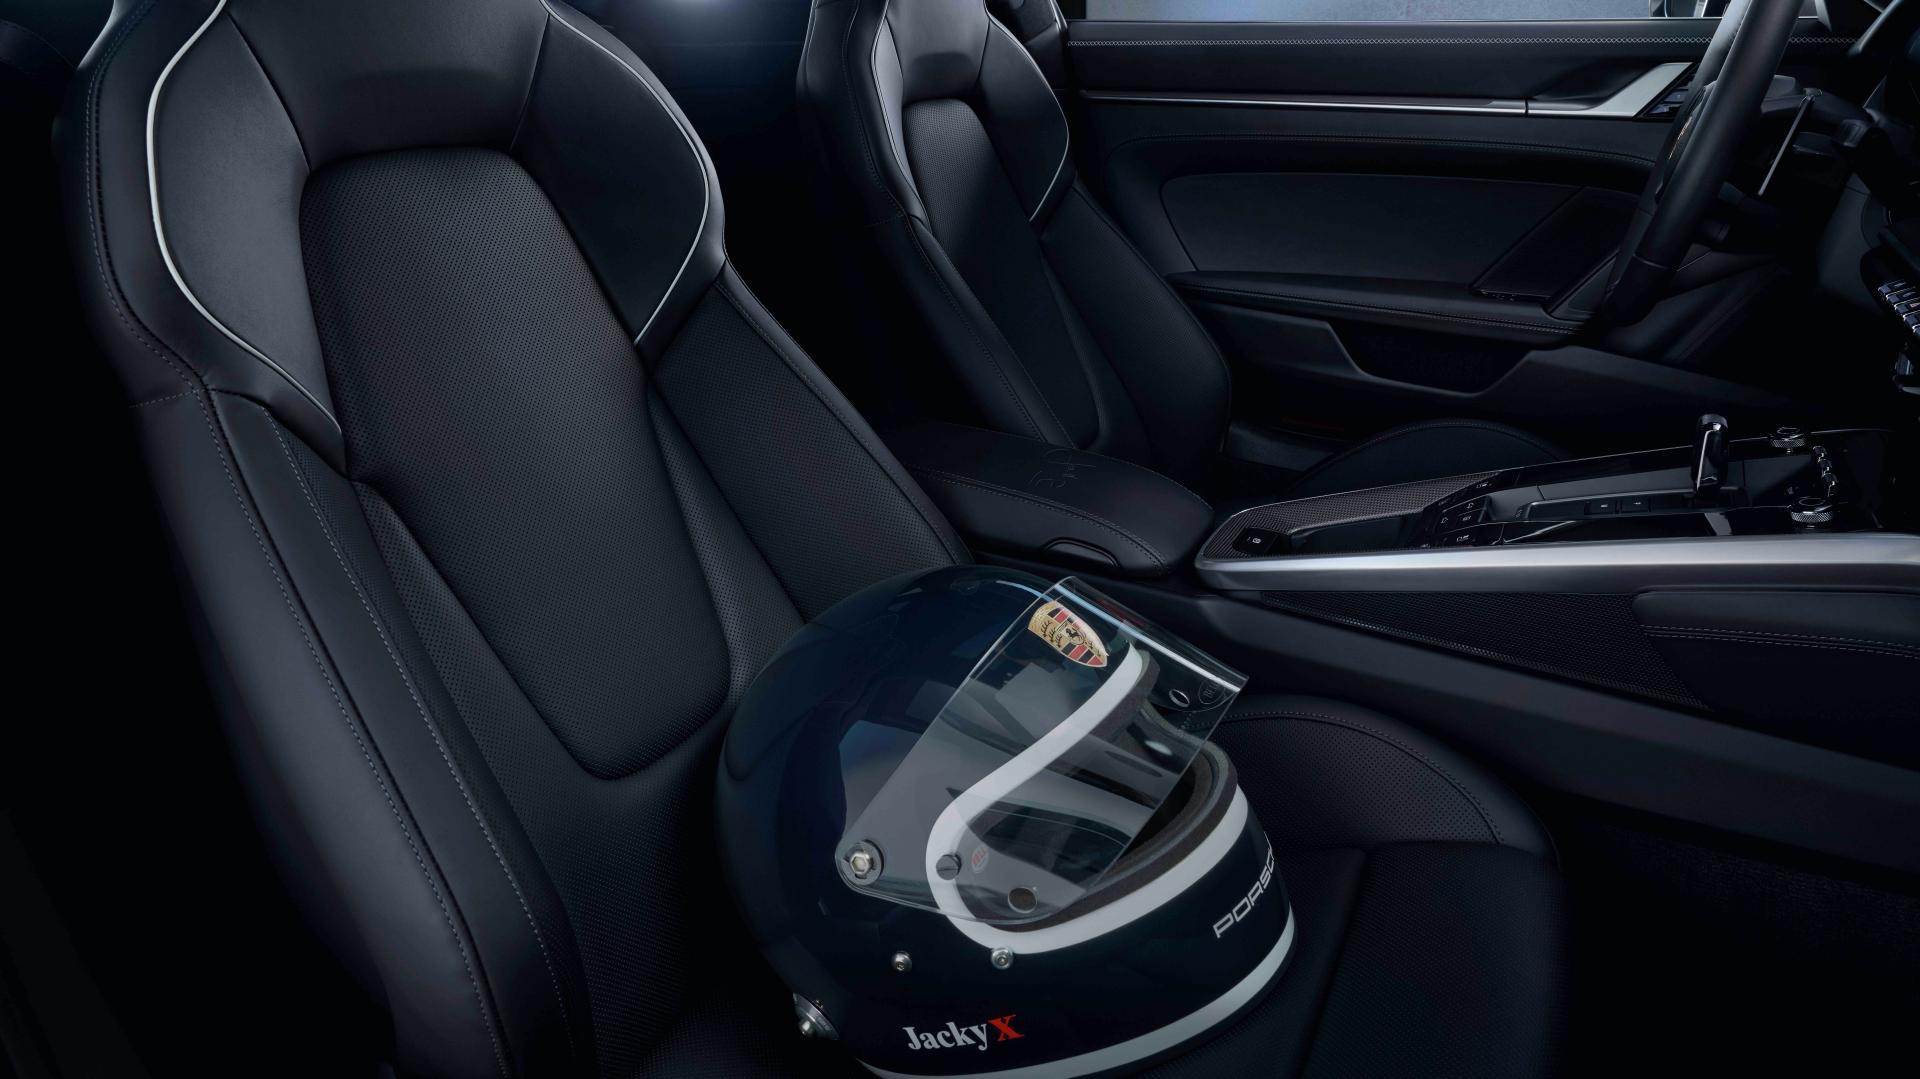 Porsche-911-Belgian-Legend-Edition-2020-Jacky-Ickx-17